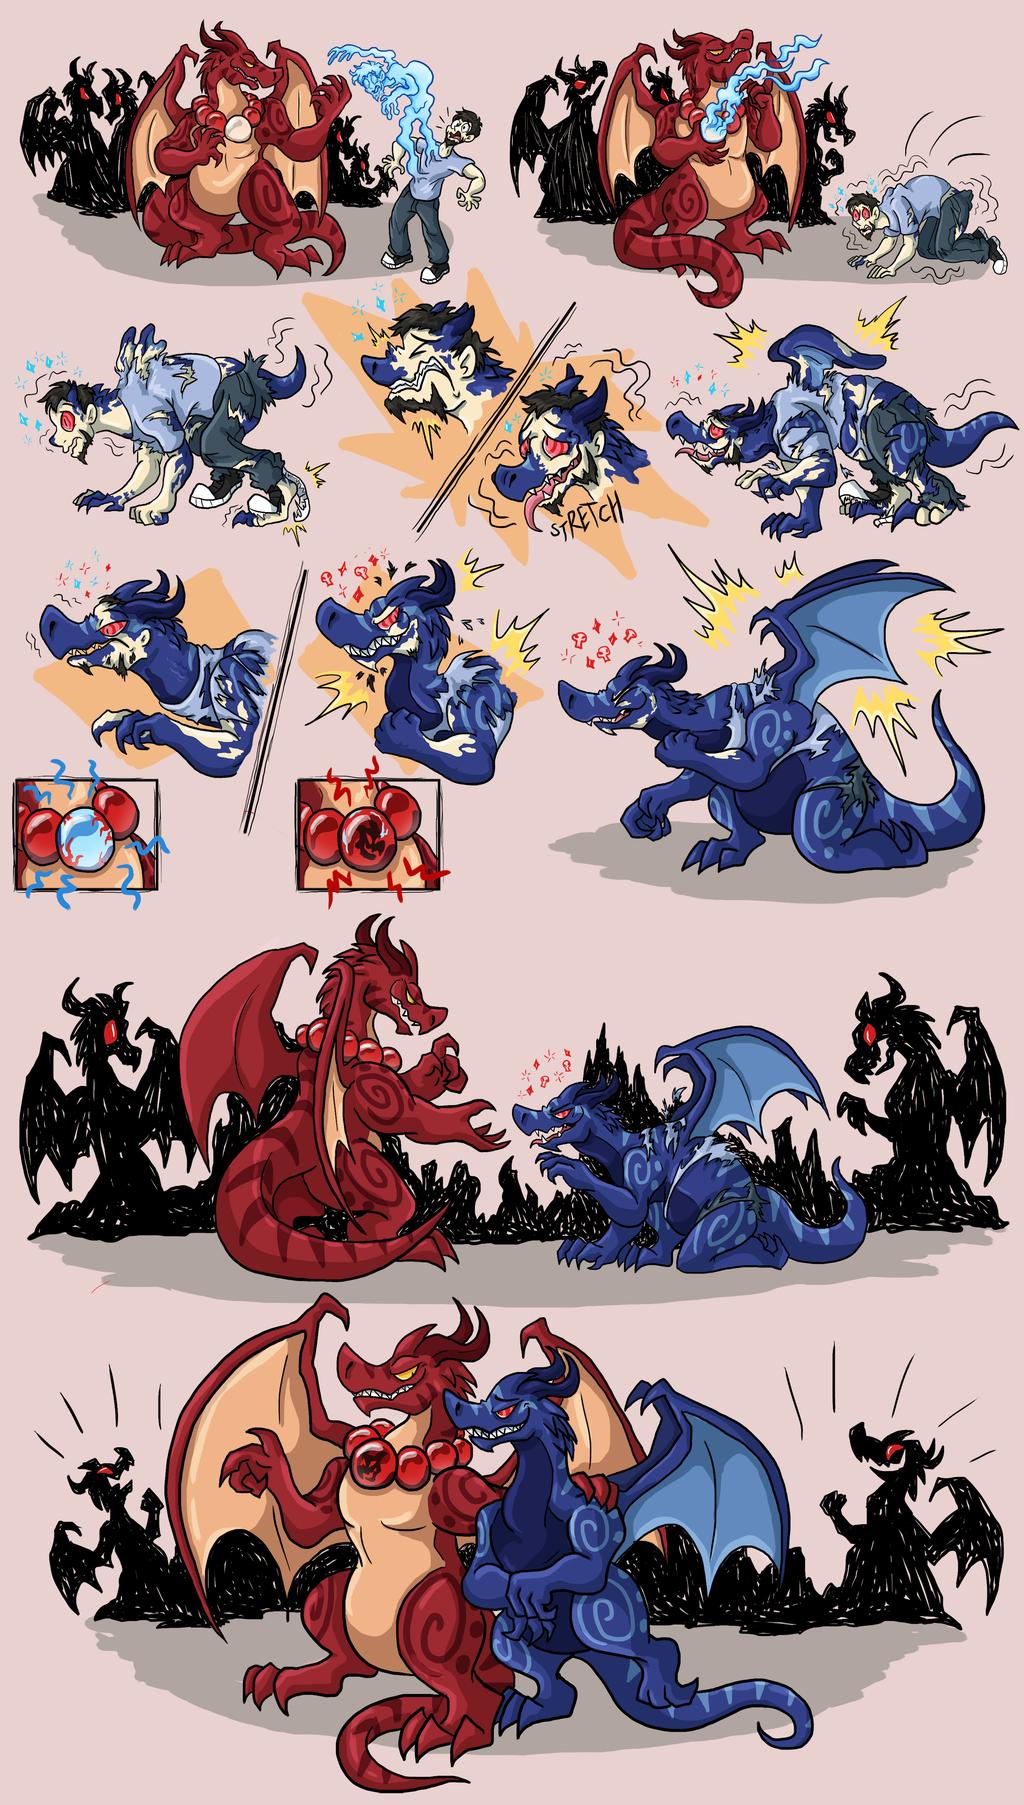 [com] The Dragon's Thrall